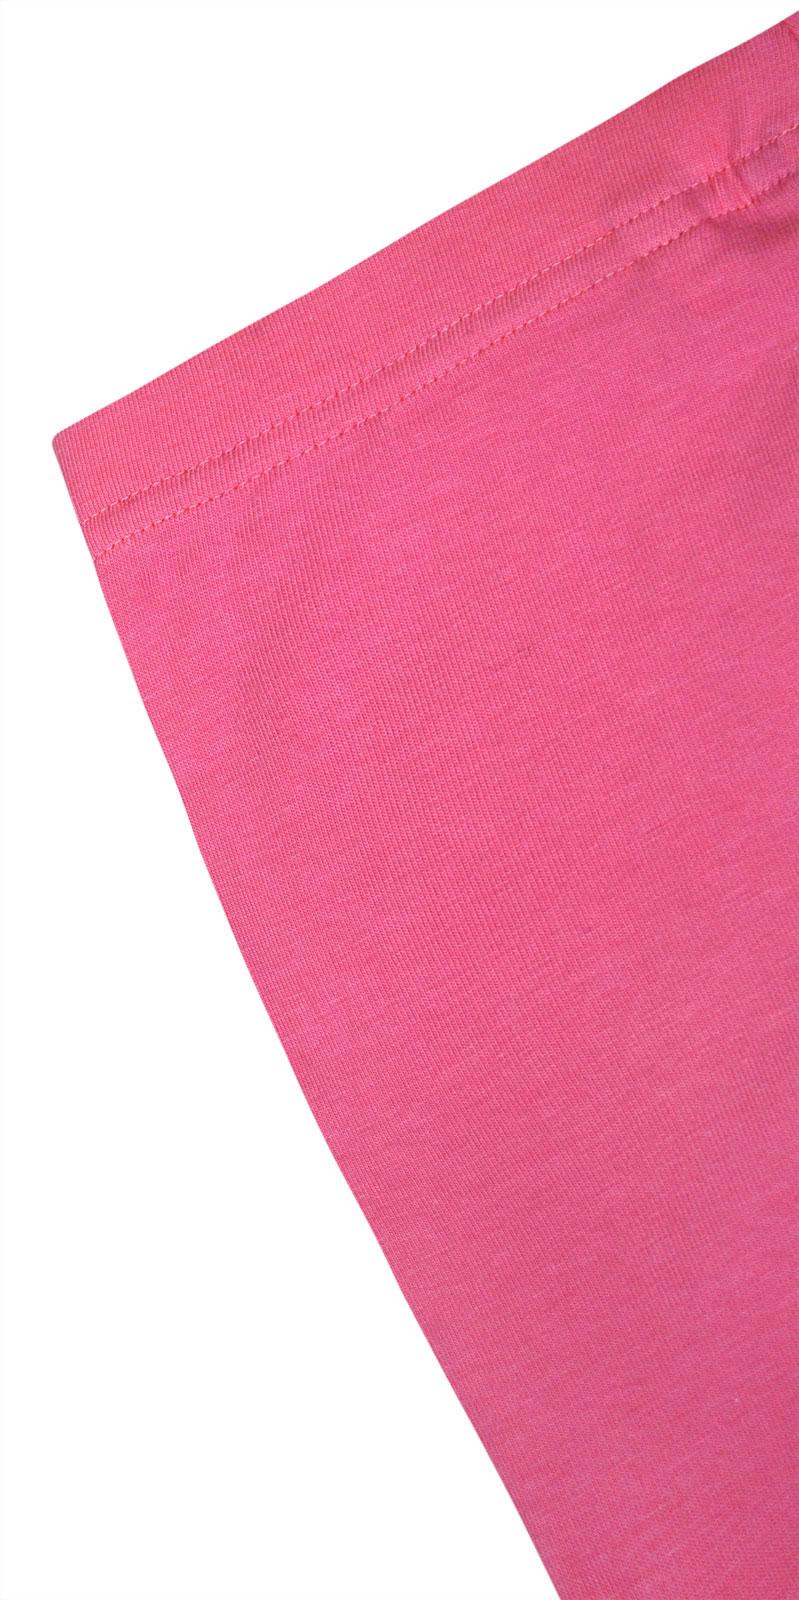 Girls-Next-Leggings-Kids-New-Pants-Age-2-3-4-5-6-7-8-9-10-11-12-13-14-15-16-Yrs thumbnail 16